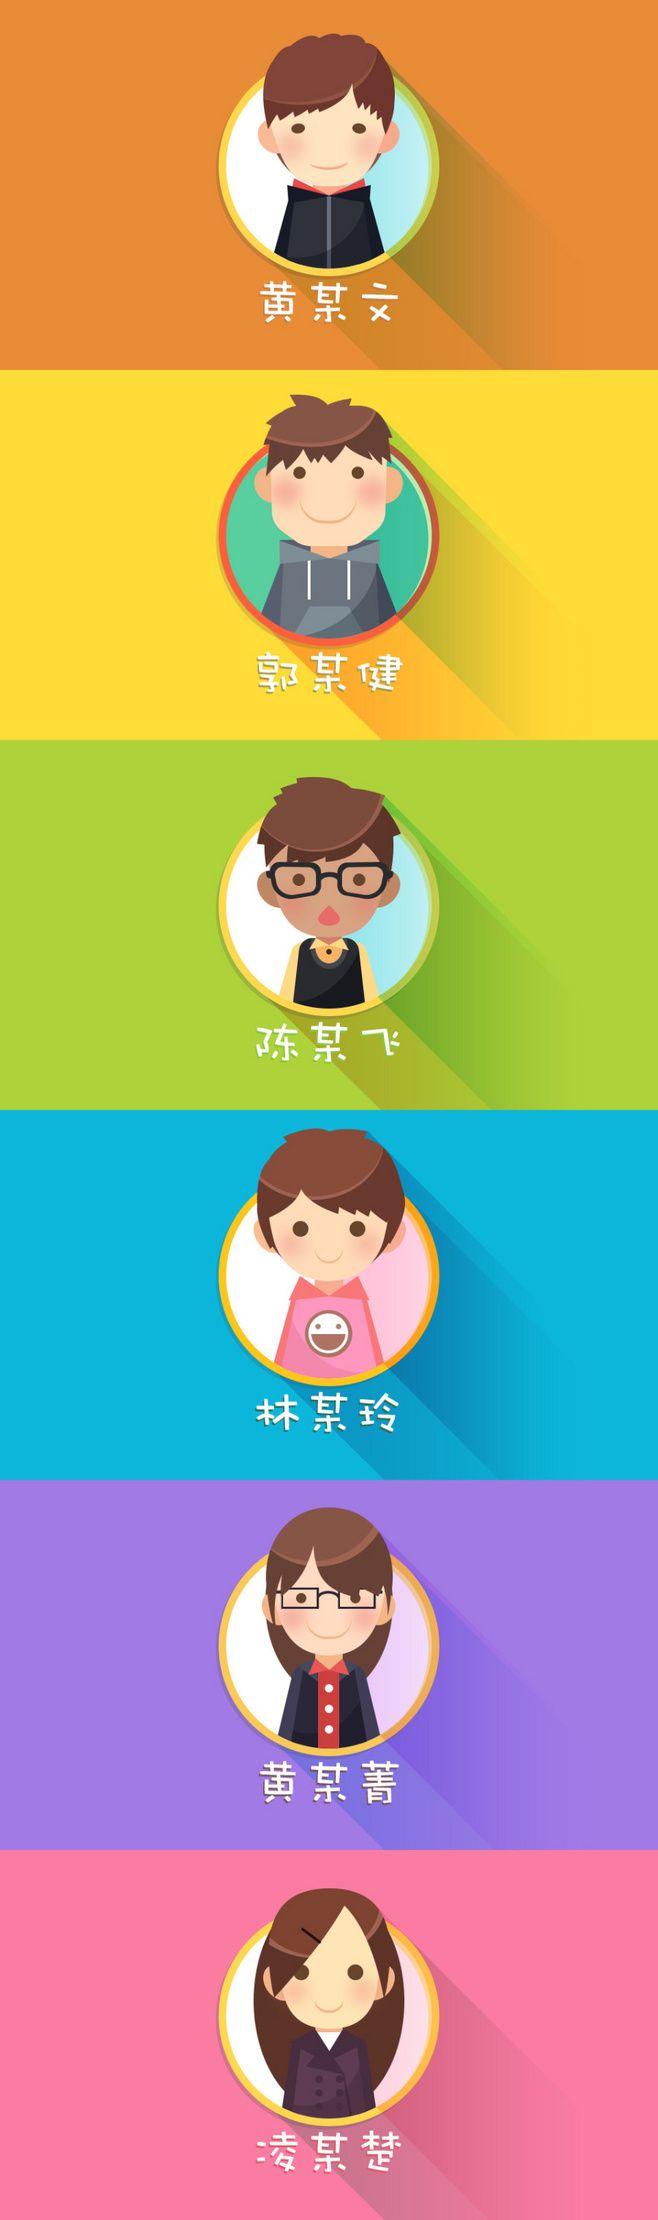 DIY扁平化头像❤-其他绘画-插画 by...